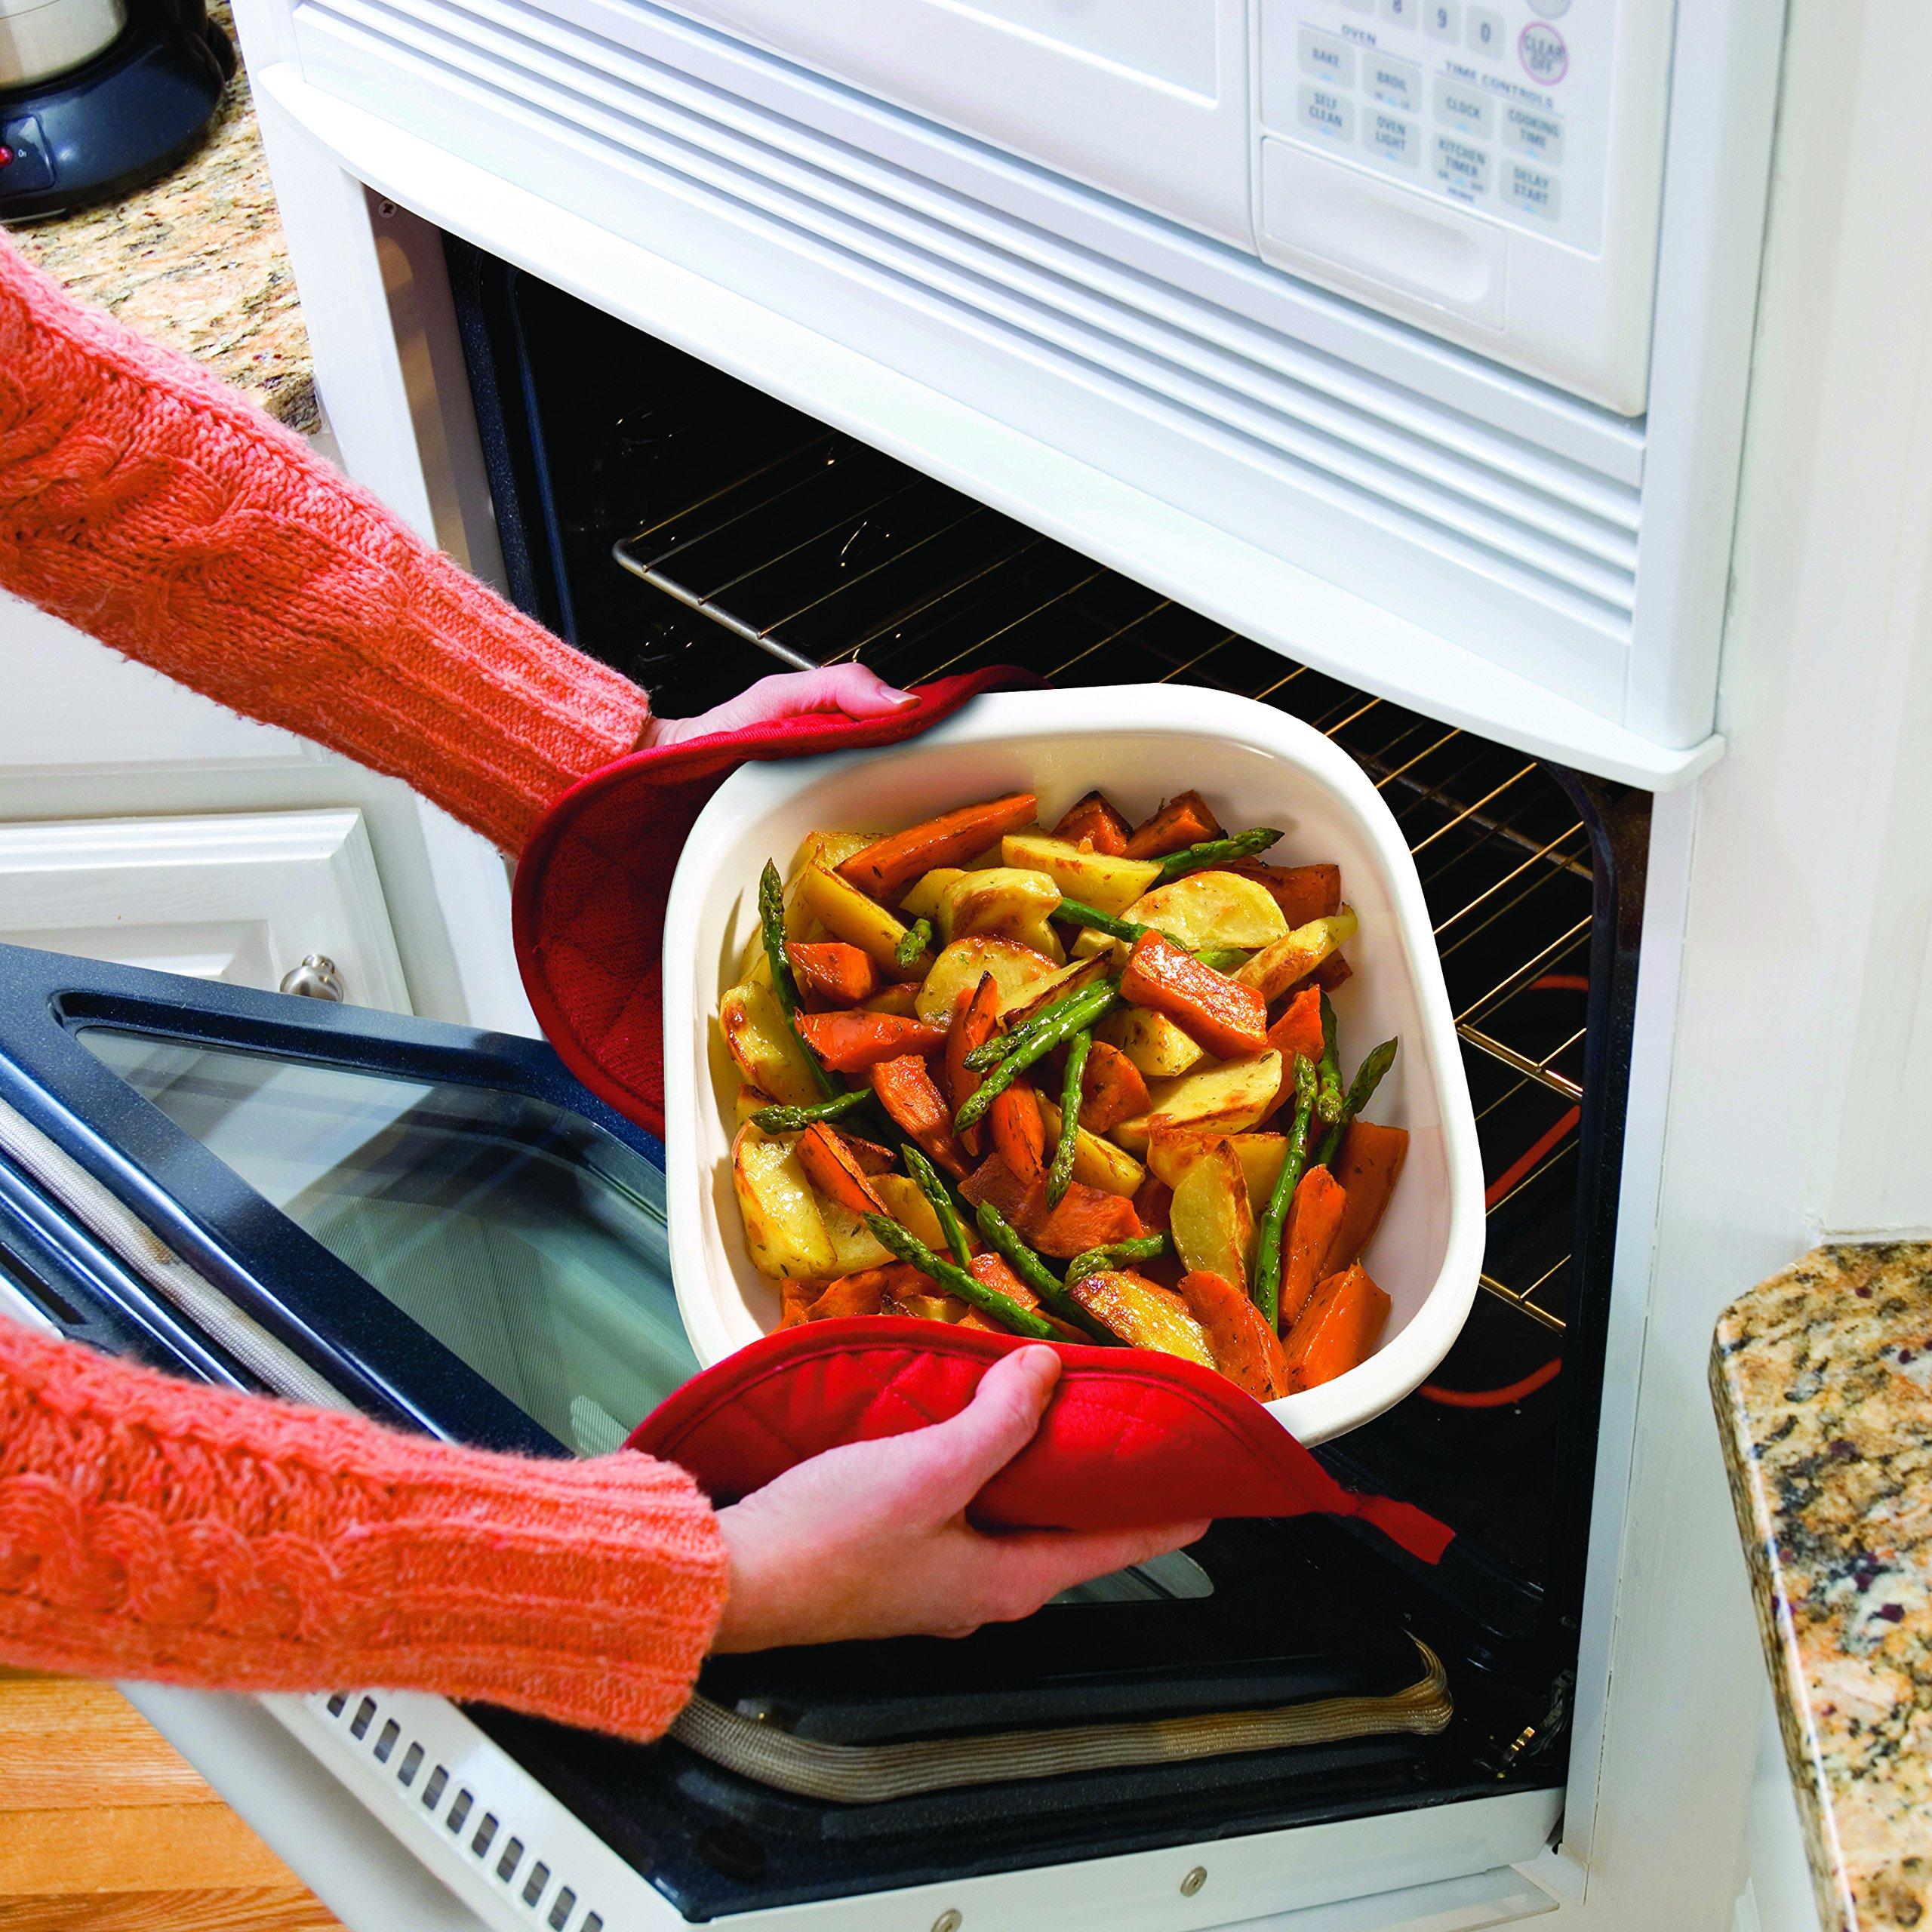 CorningWare SimplyLite 3-Quart Oblong Baking Dish with Plastic Lid by CorningWare (Image #4)